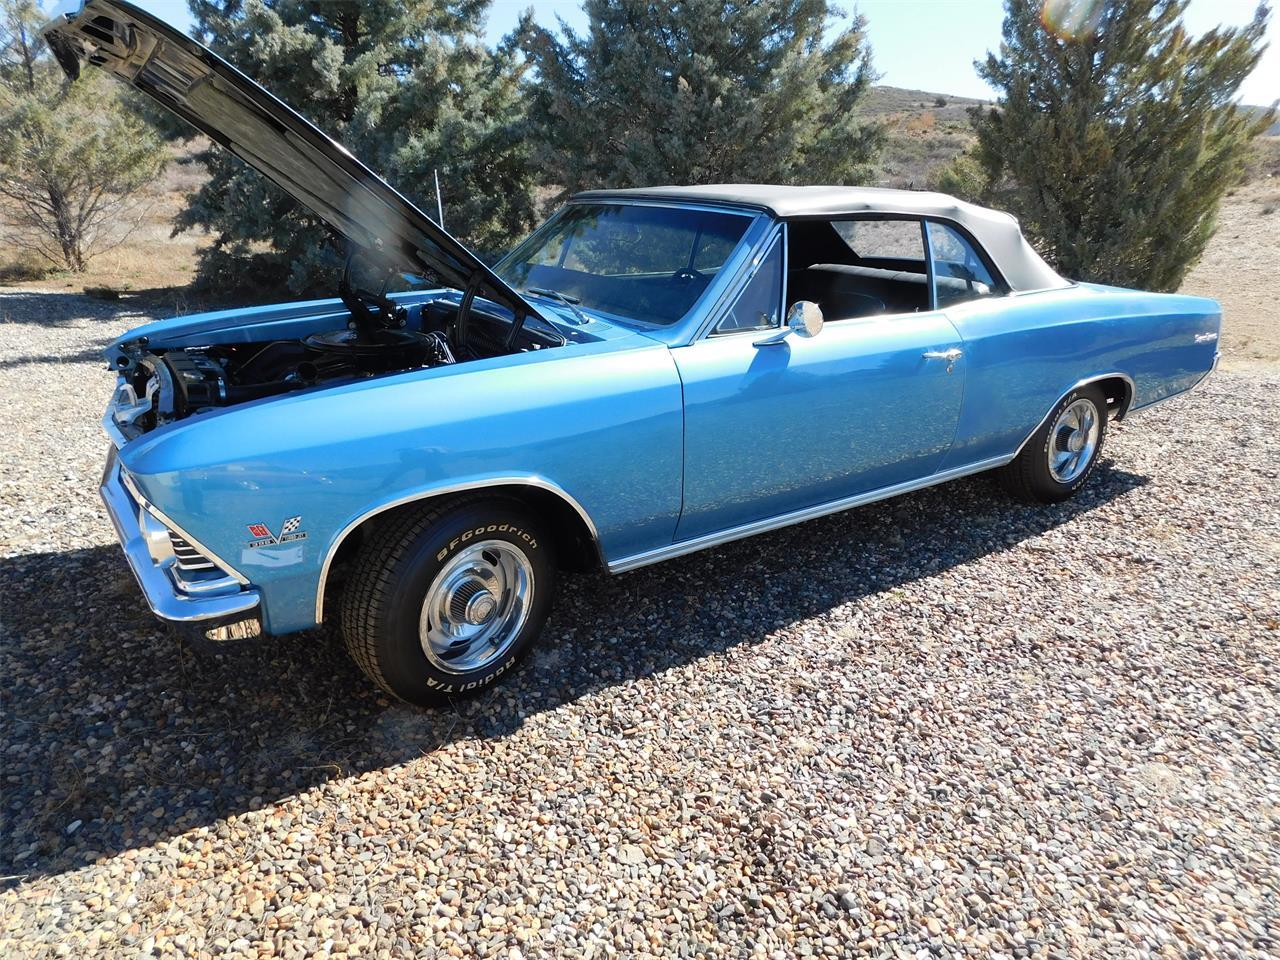 1966 Chevrolet Chevelle SS (CC-1196744) for sale in Dewey, Arizona